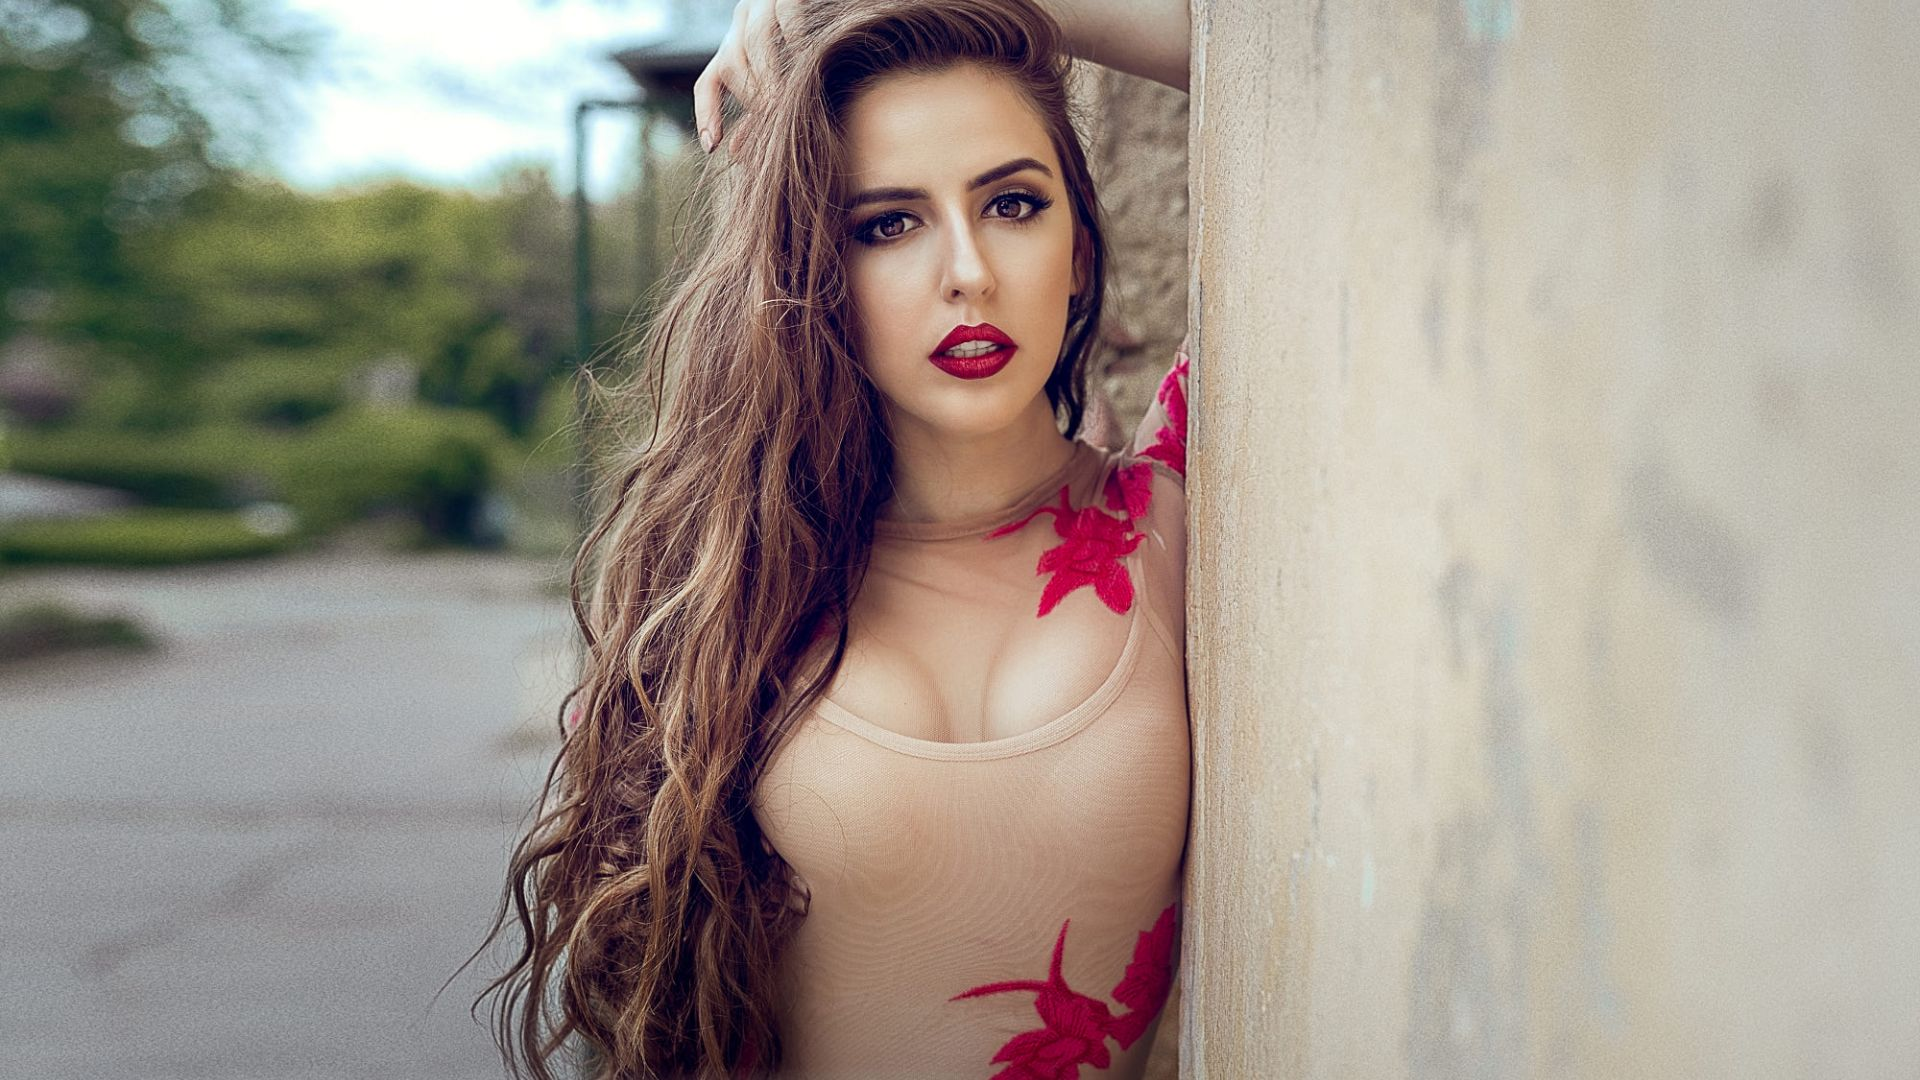 Wallpaper Red lips, hot & brunette woman